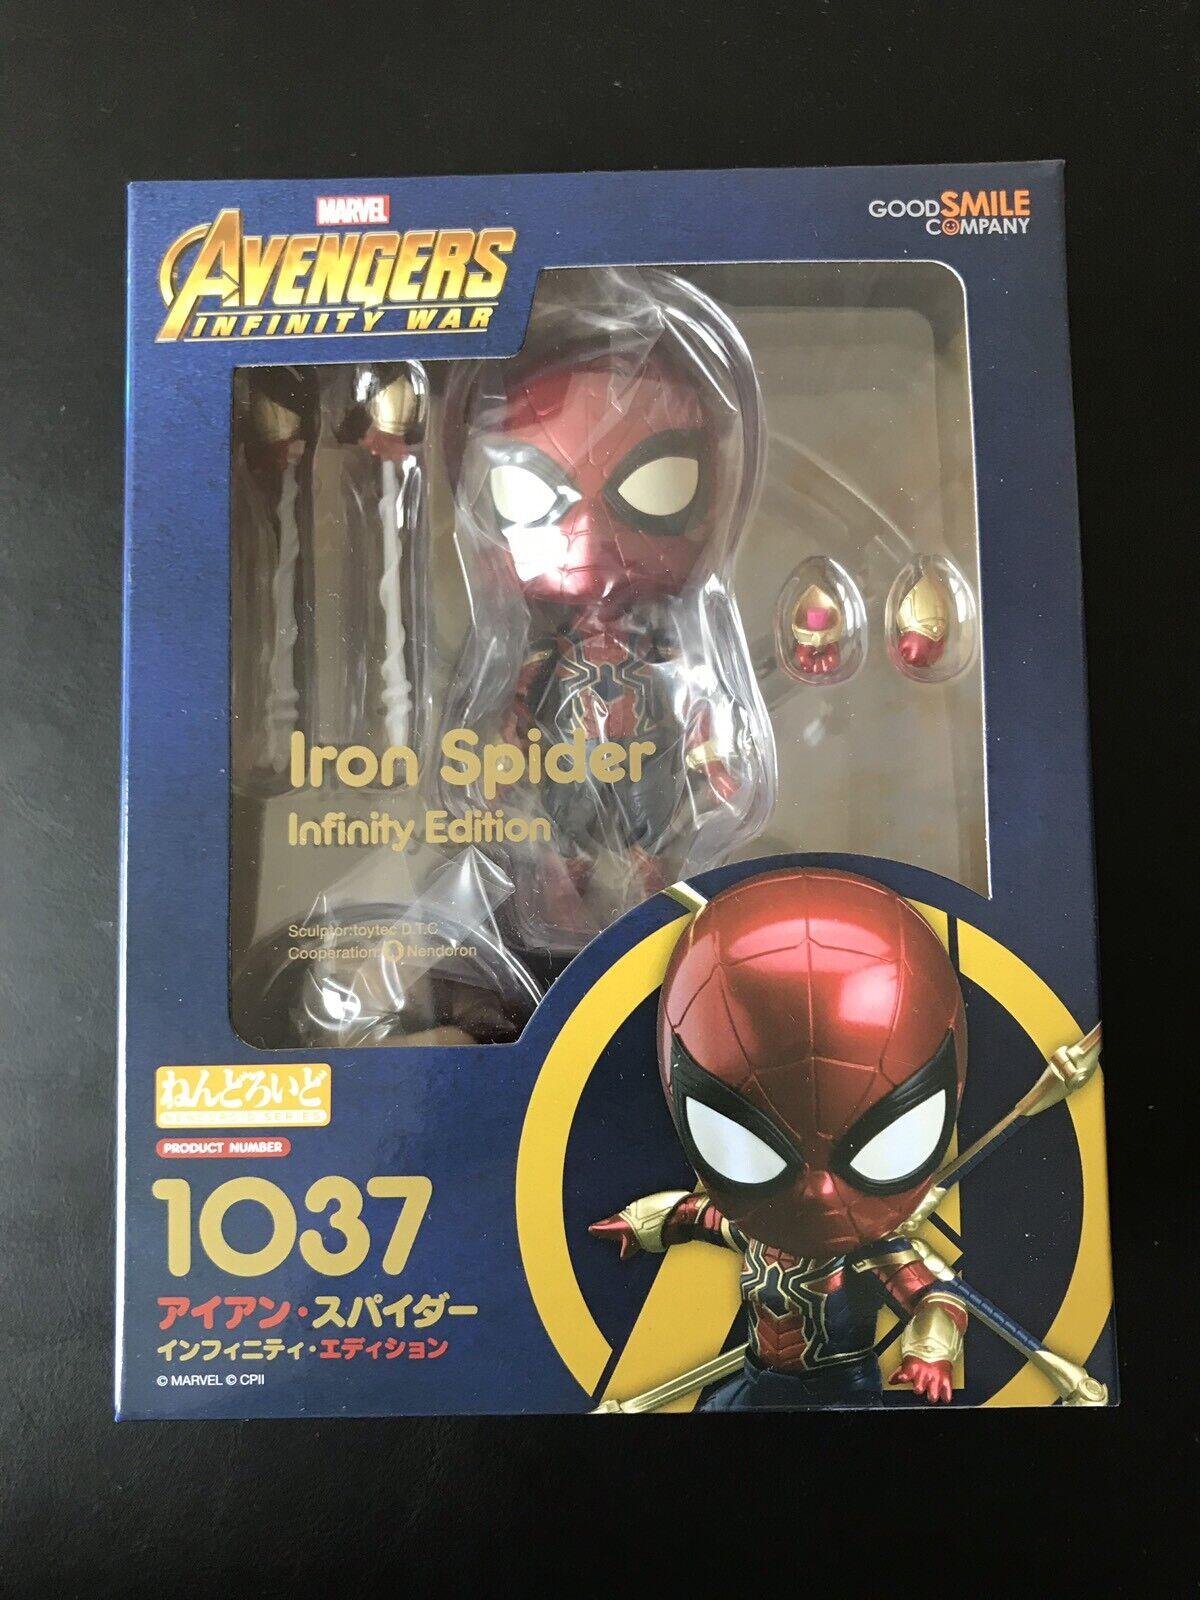 Iron Spider Man Infinity Edition Avengers Marvel NendGoldid Goossmile  10037